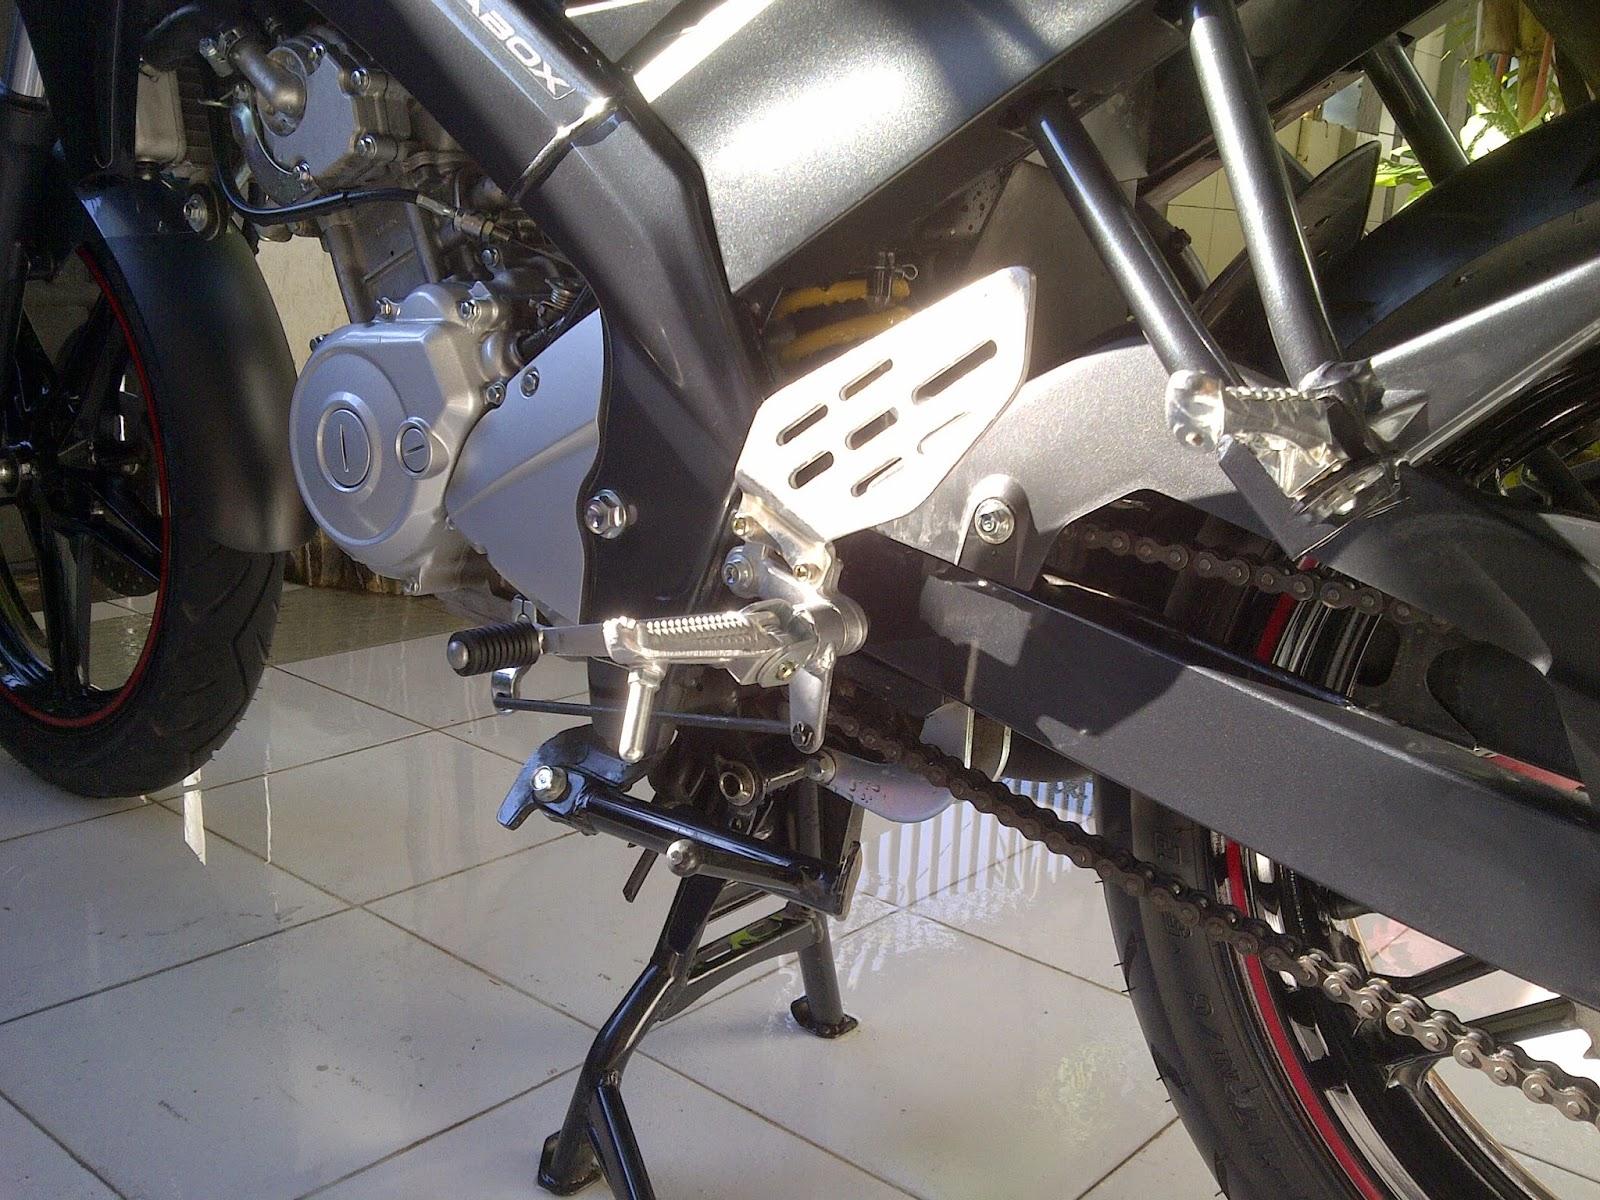 Bebeksableng Ragam Keluhan Yamaha New Vixion Lightning NVL